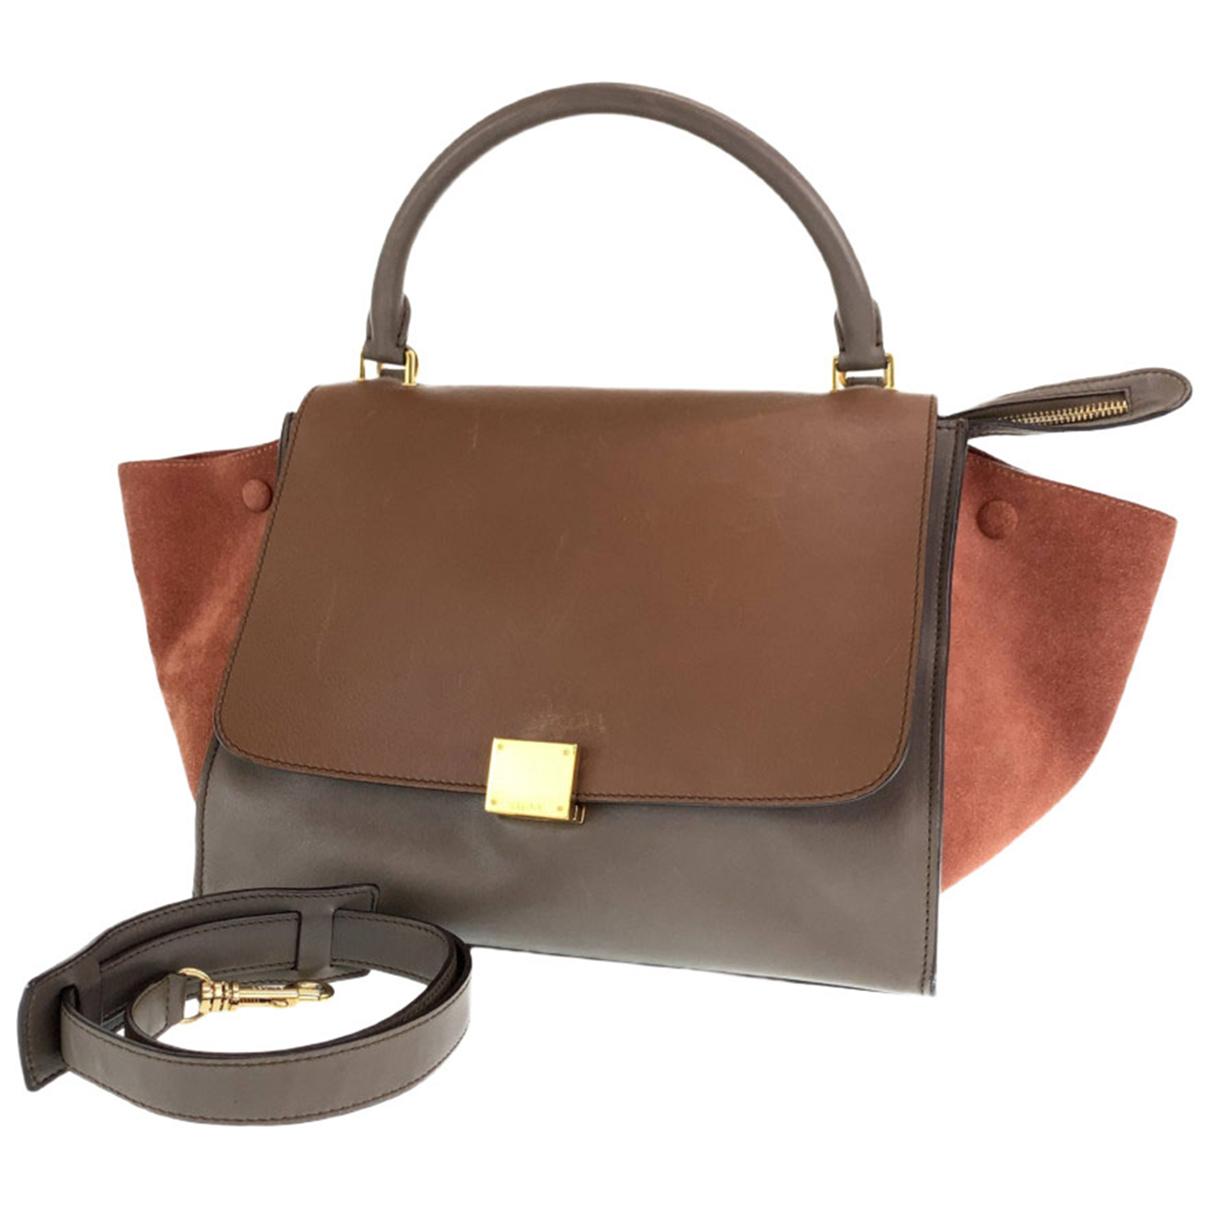 Gucci \N Handtasche in  Bunt Leder